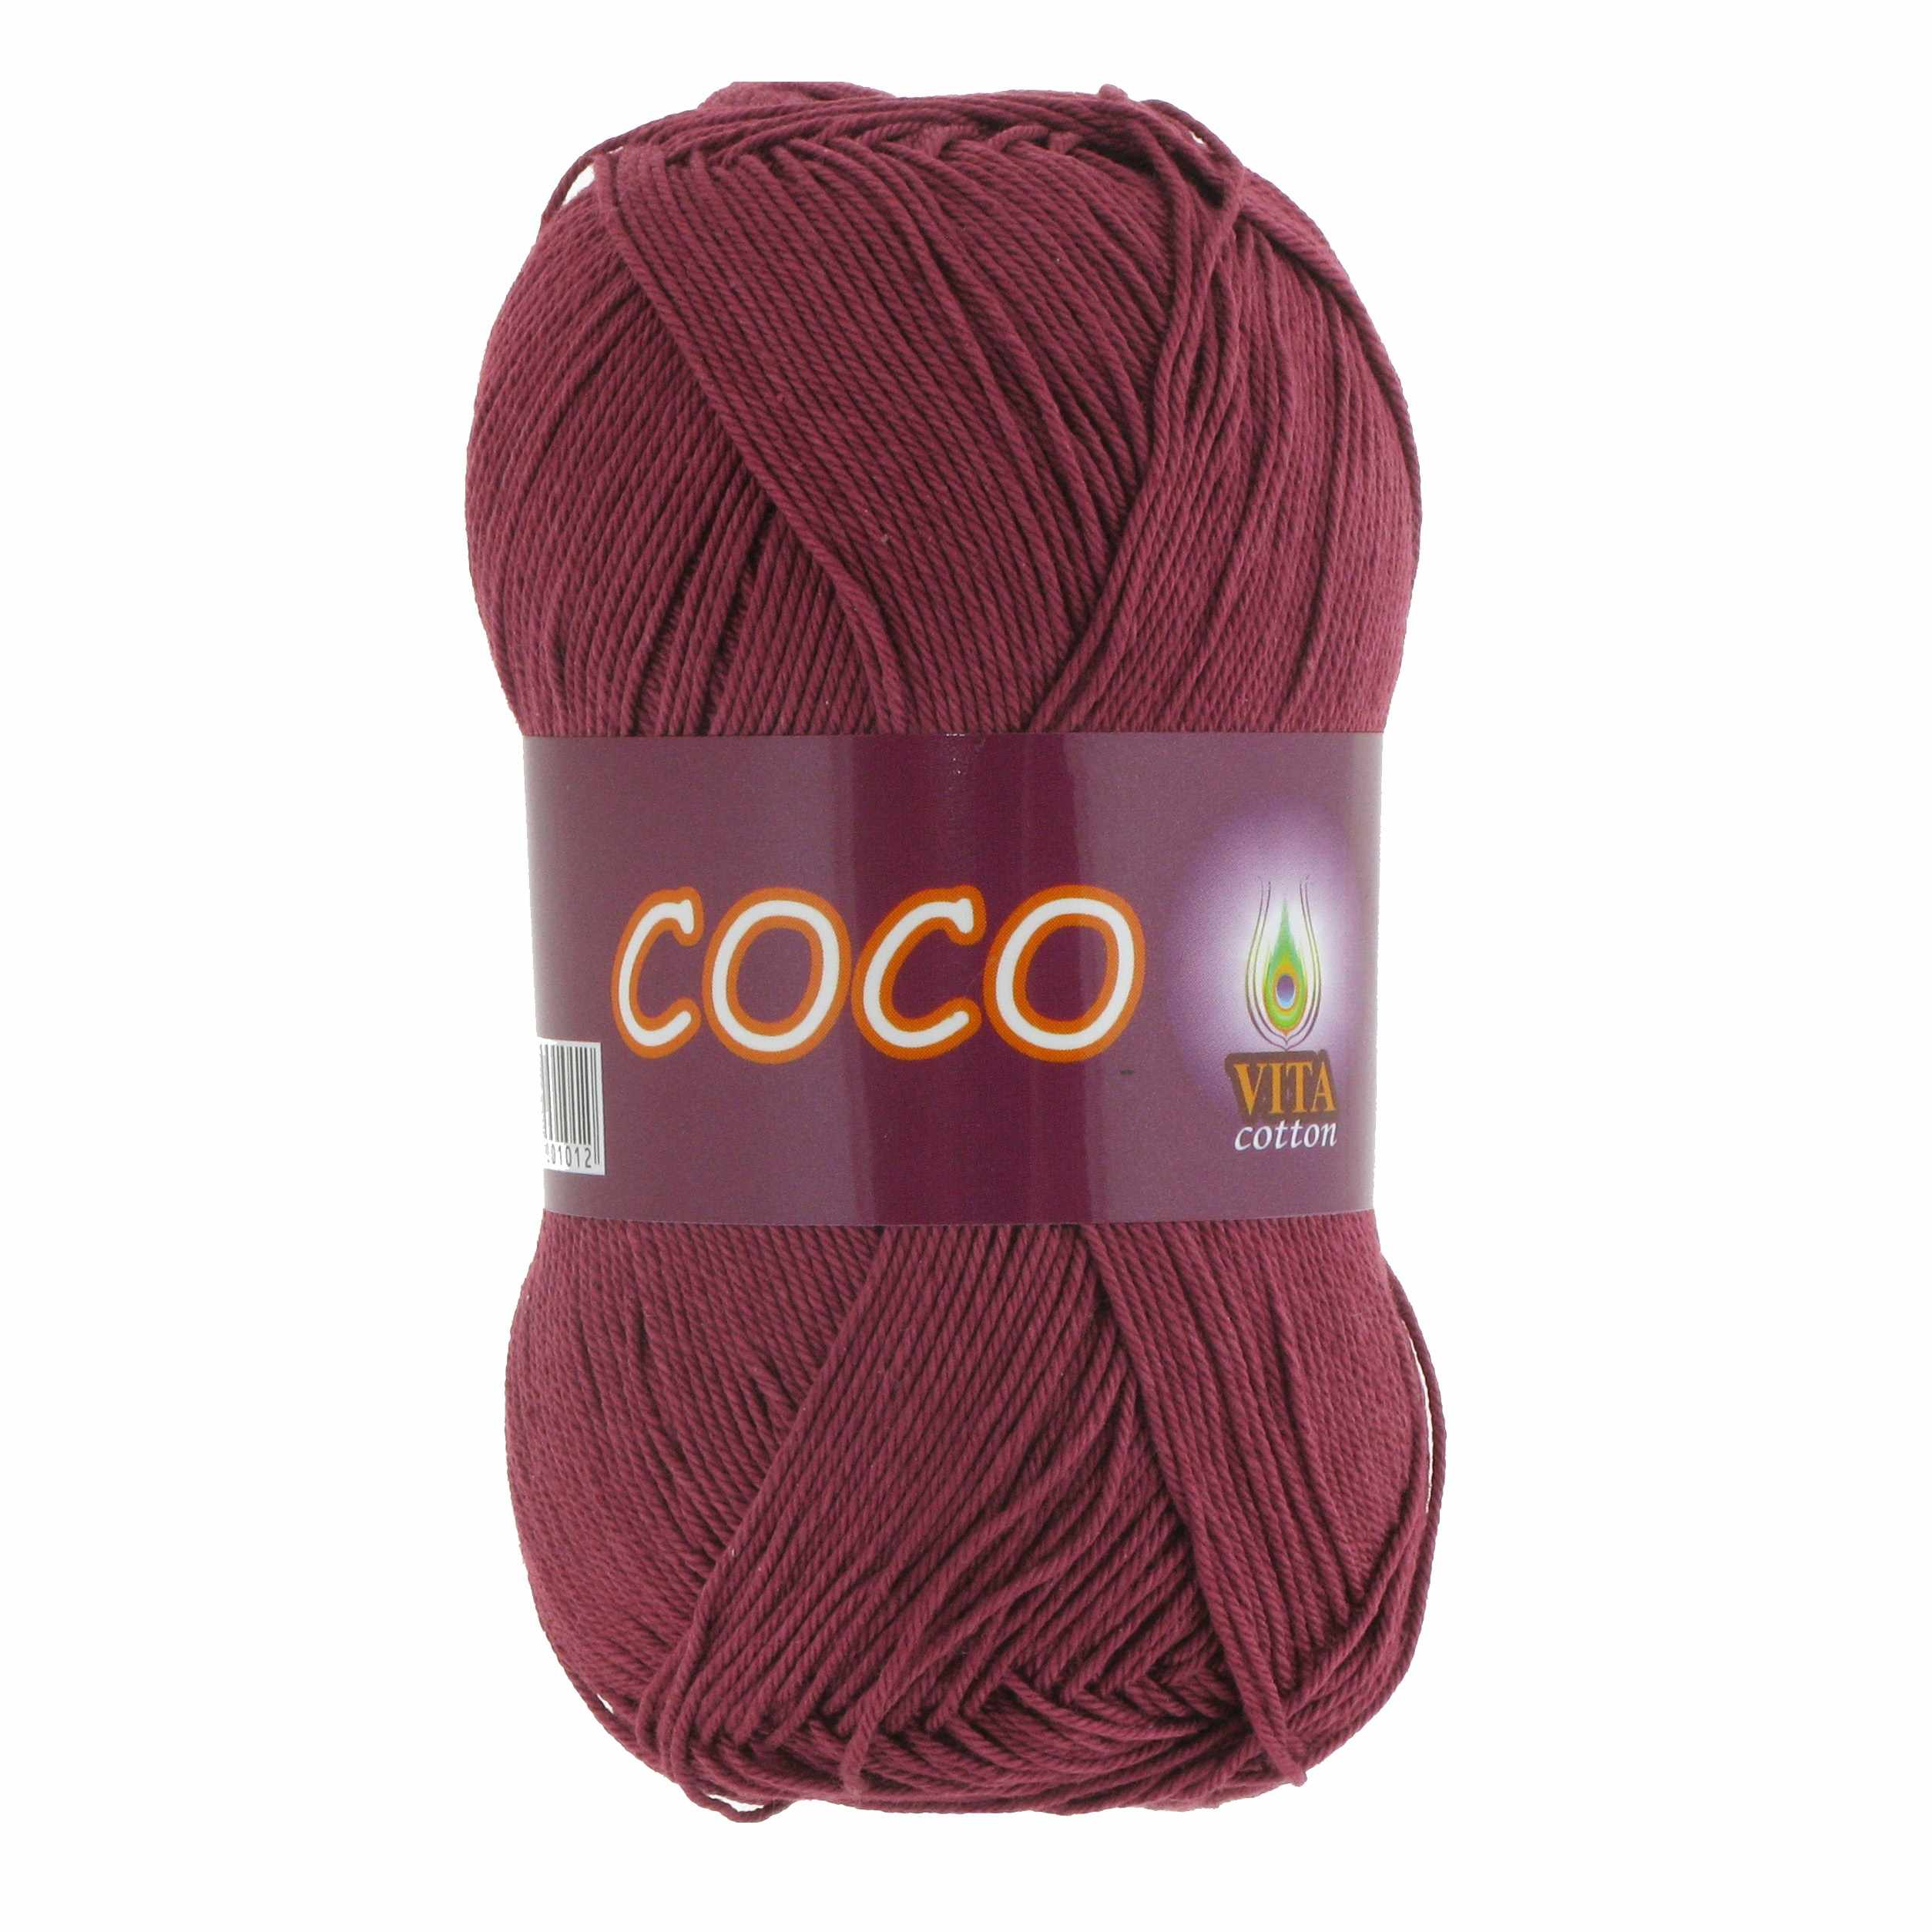 Пряжа VITA Coco Цвет.4325 Светло-вишневый